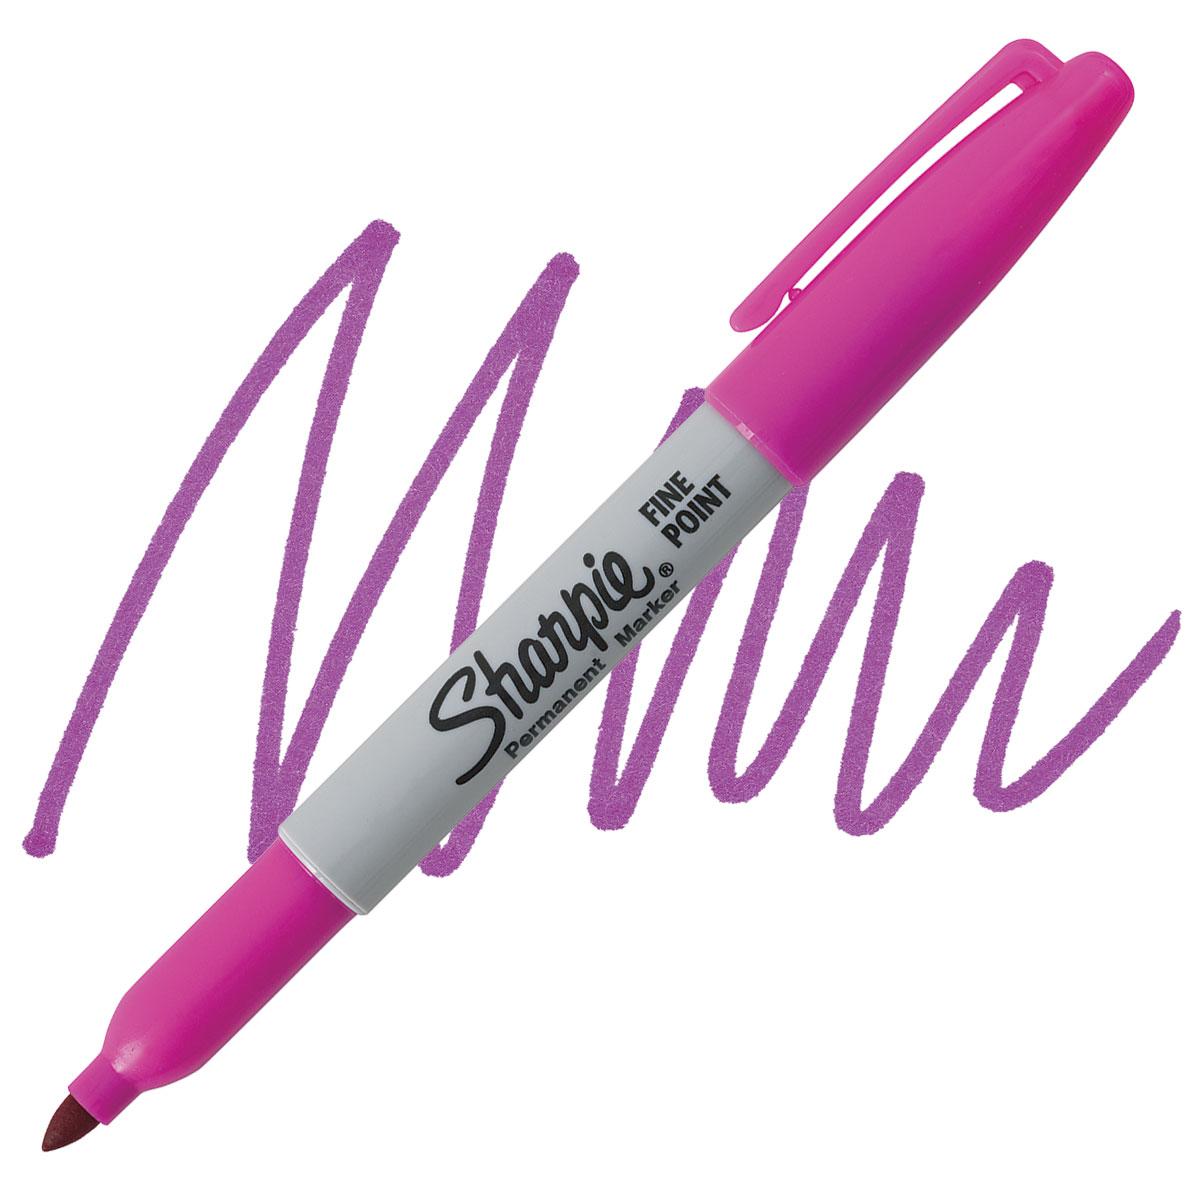 Sharpie Fine Point Permanent Marker Open Stock Magenta 071641320819 for sale online